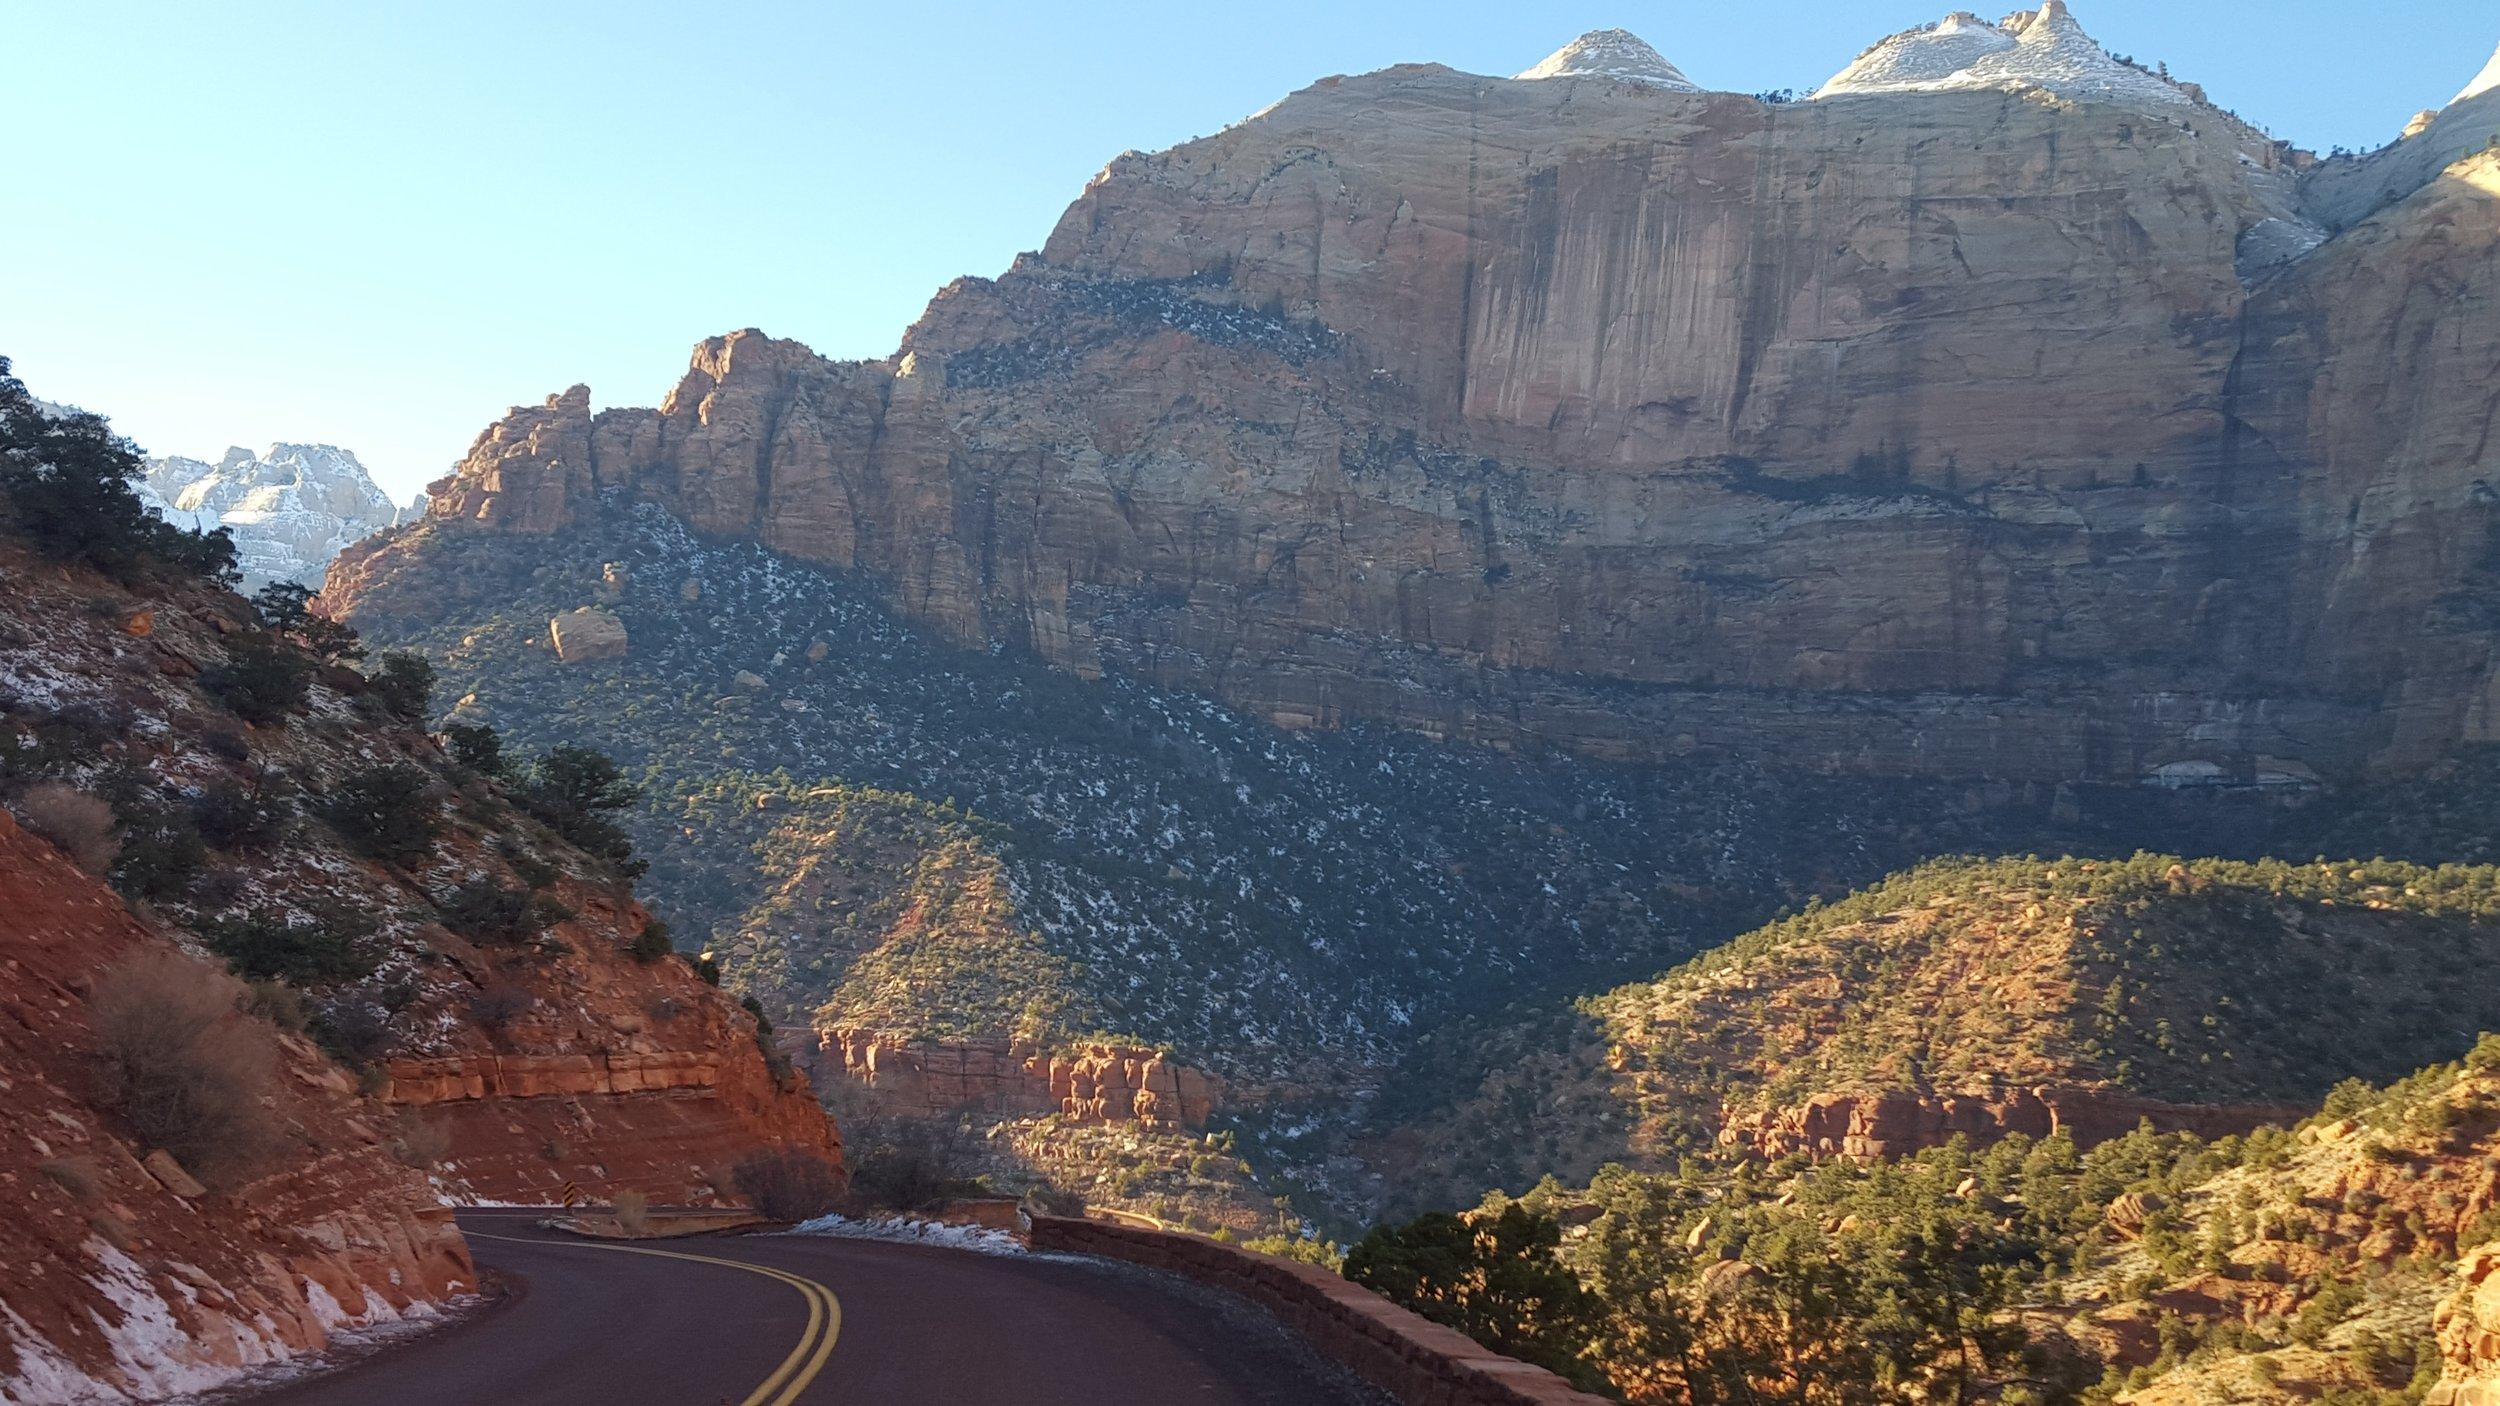 Zion National Park Road - Top Five National Parks